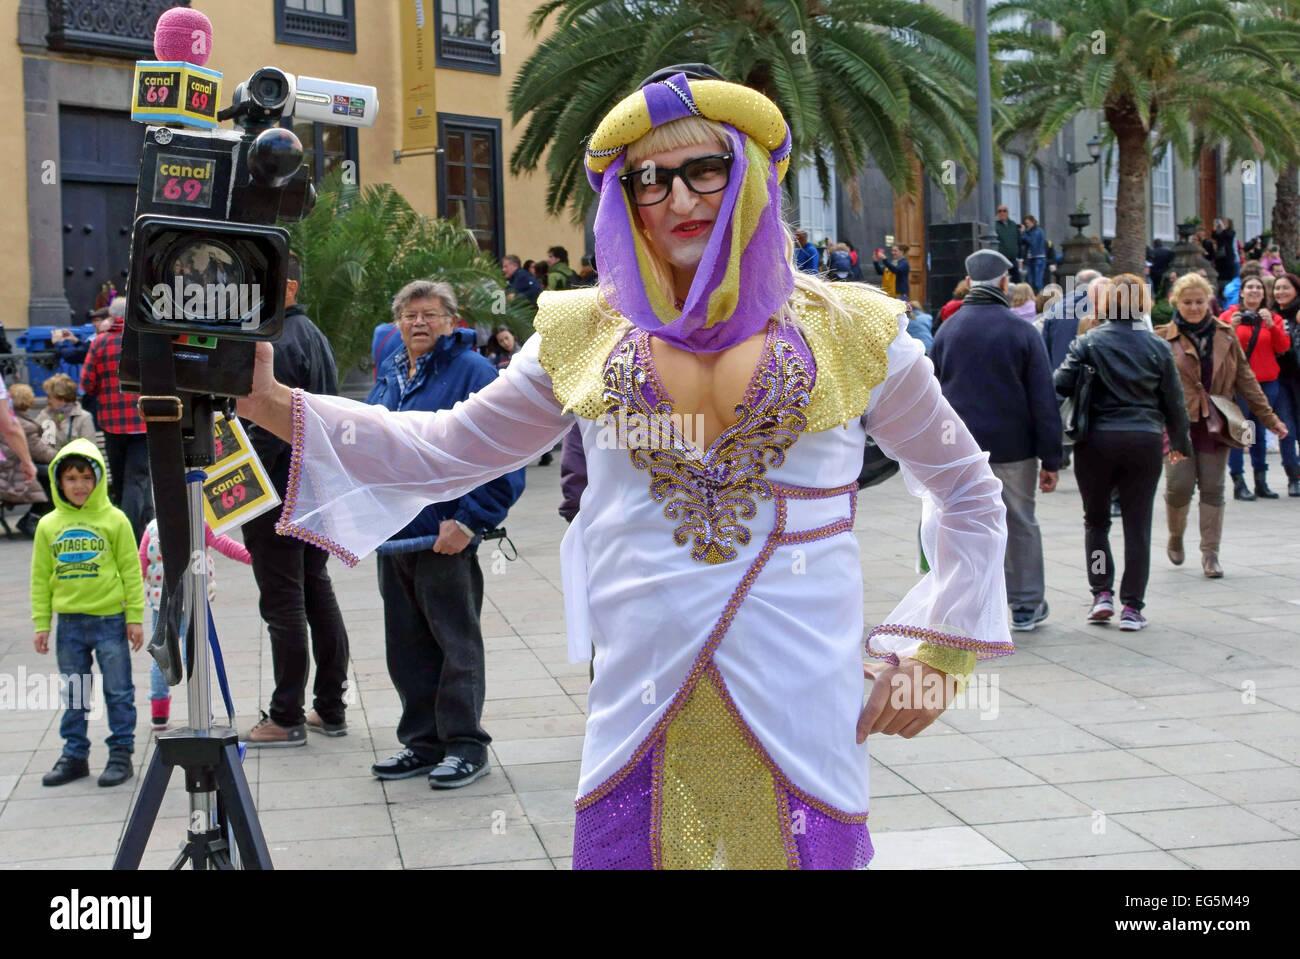 Transvestite fake tv cameraman at carnival las palmas de gran stock photo royalty free image - Gran canaria tv com ...